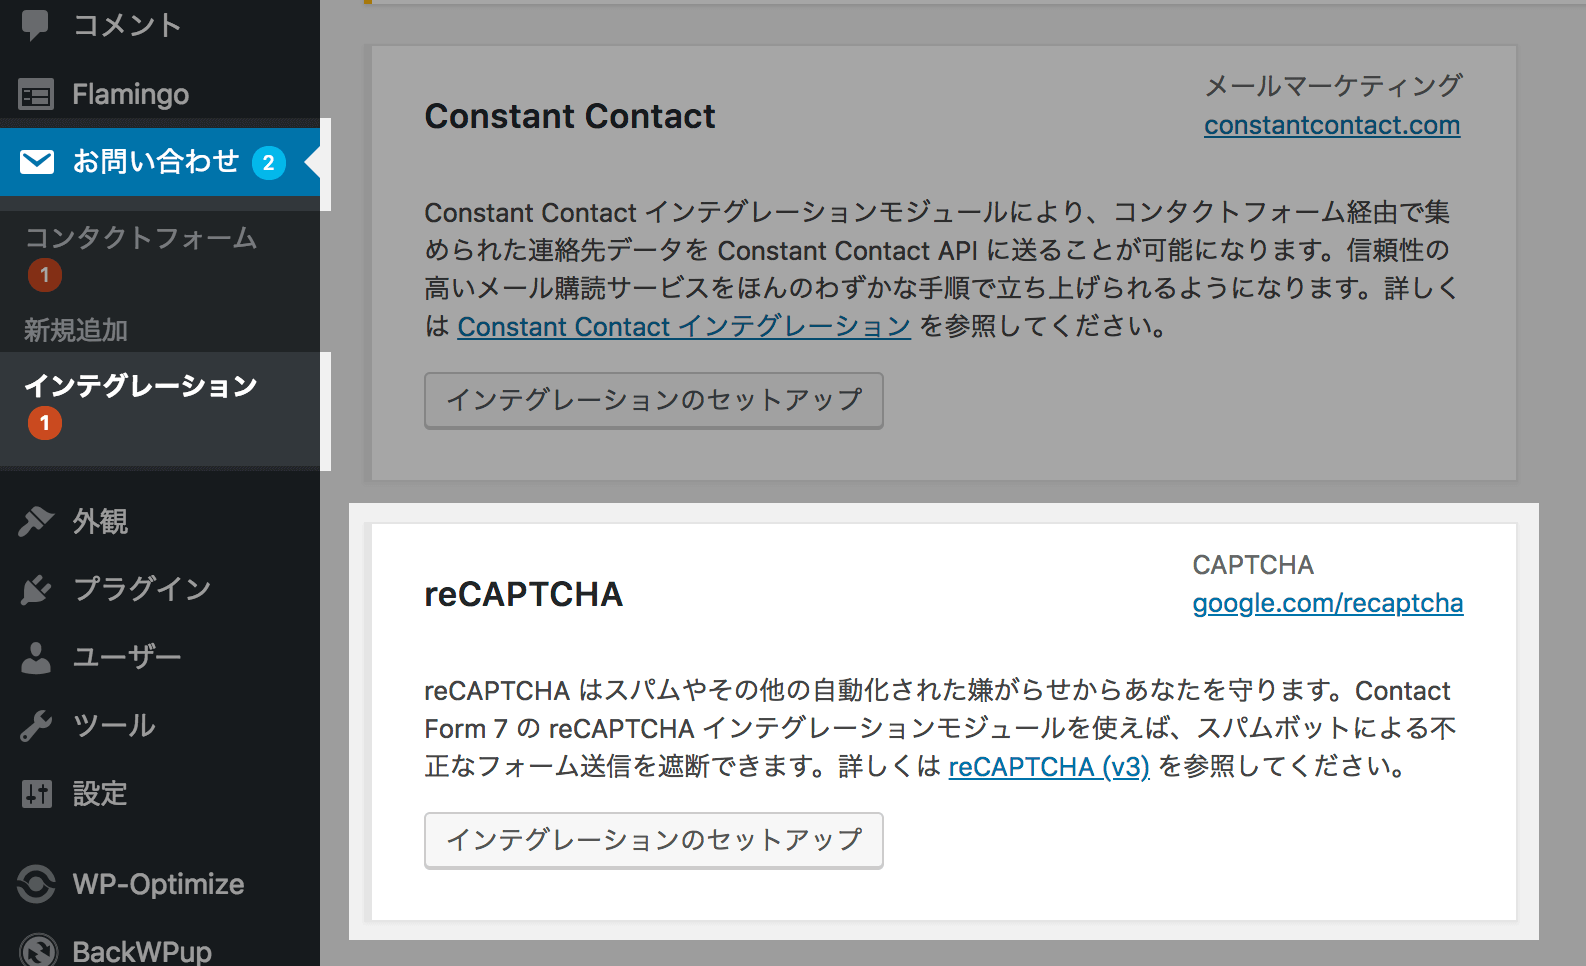 Contact Form 7でreCAPTCHAの設定をする